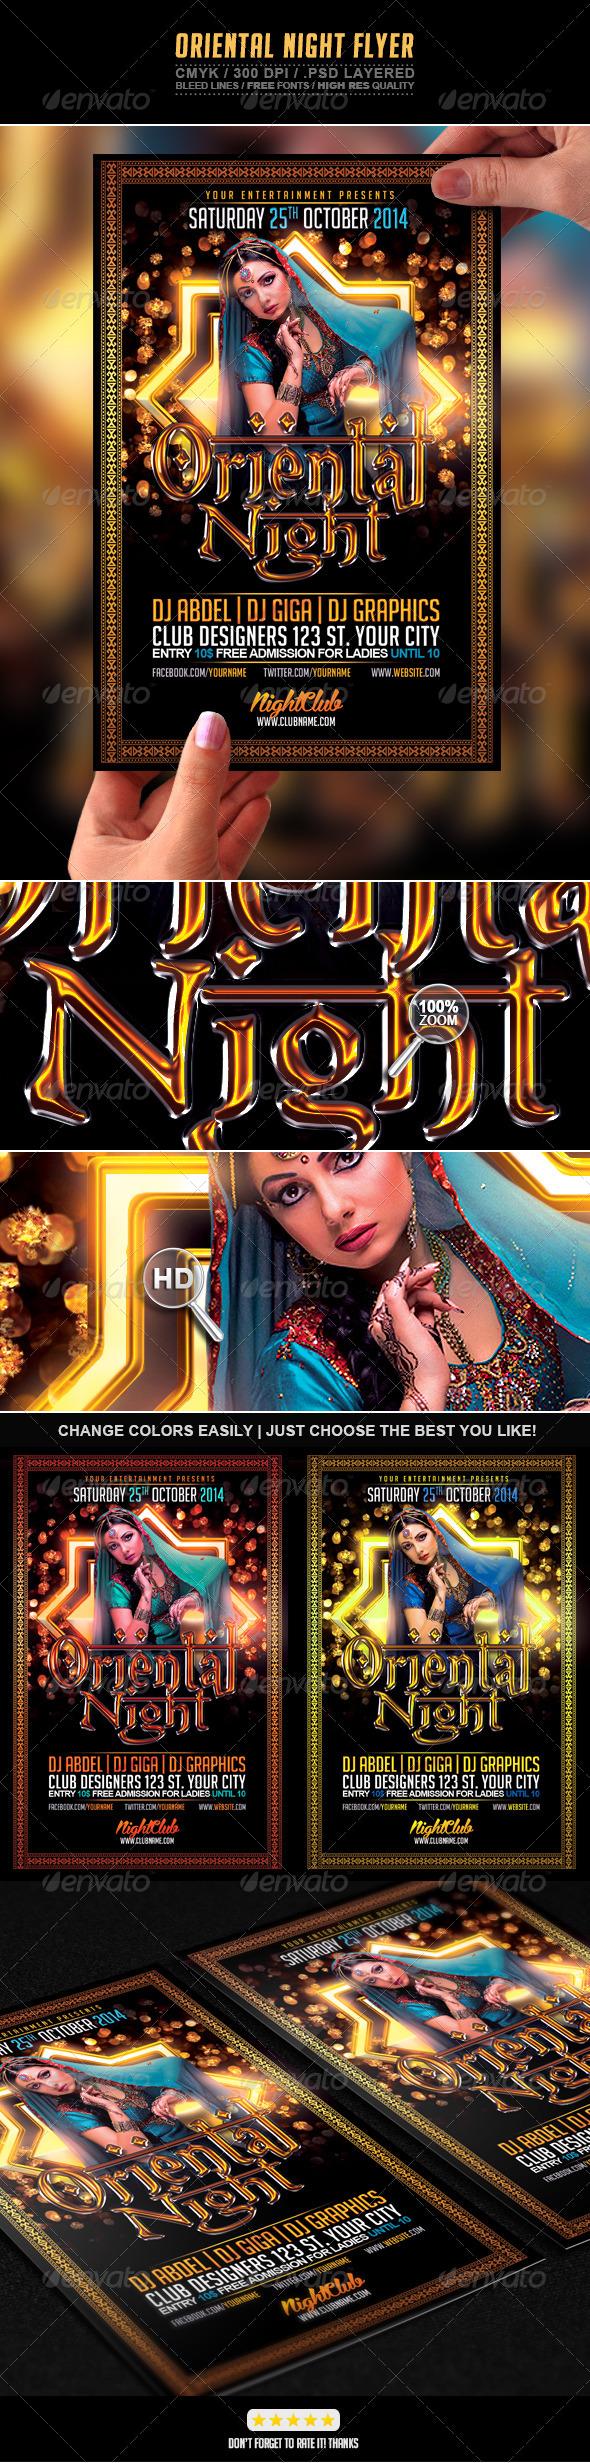 GraphicRiver Oriental Night Flyer 7143273